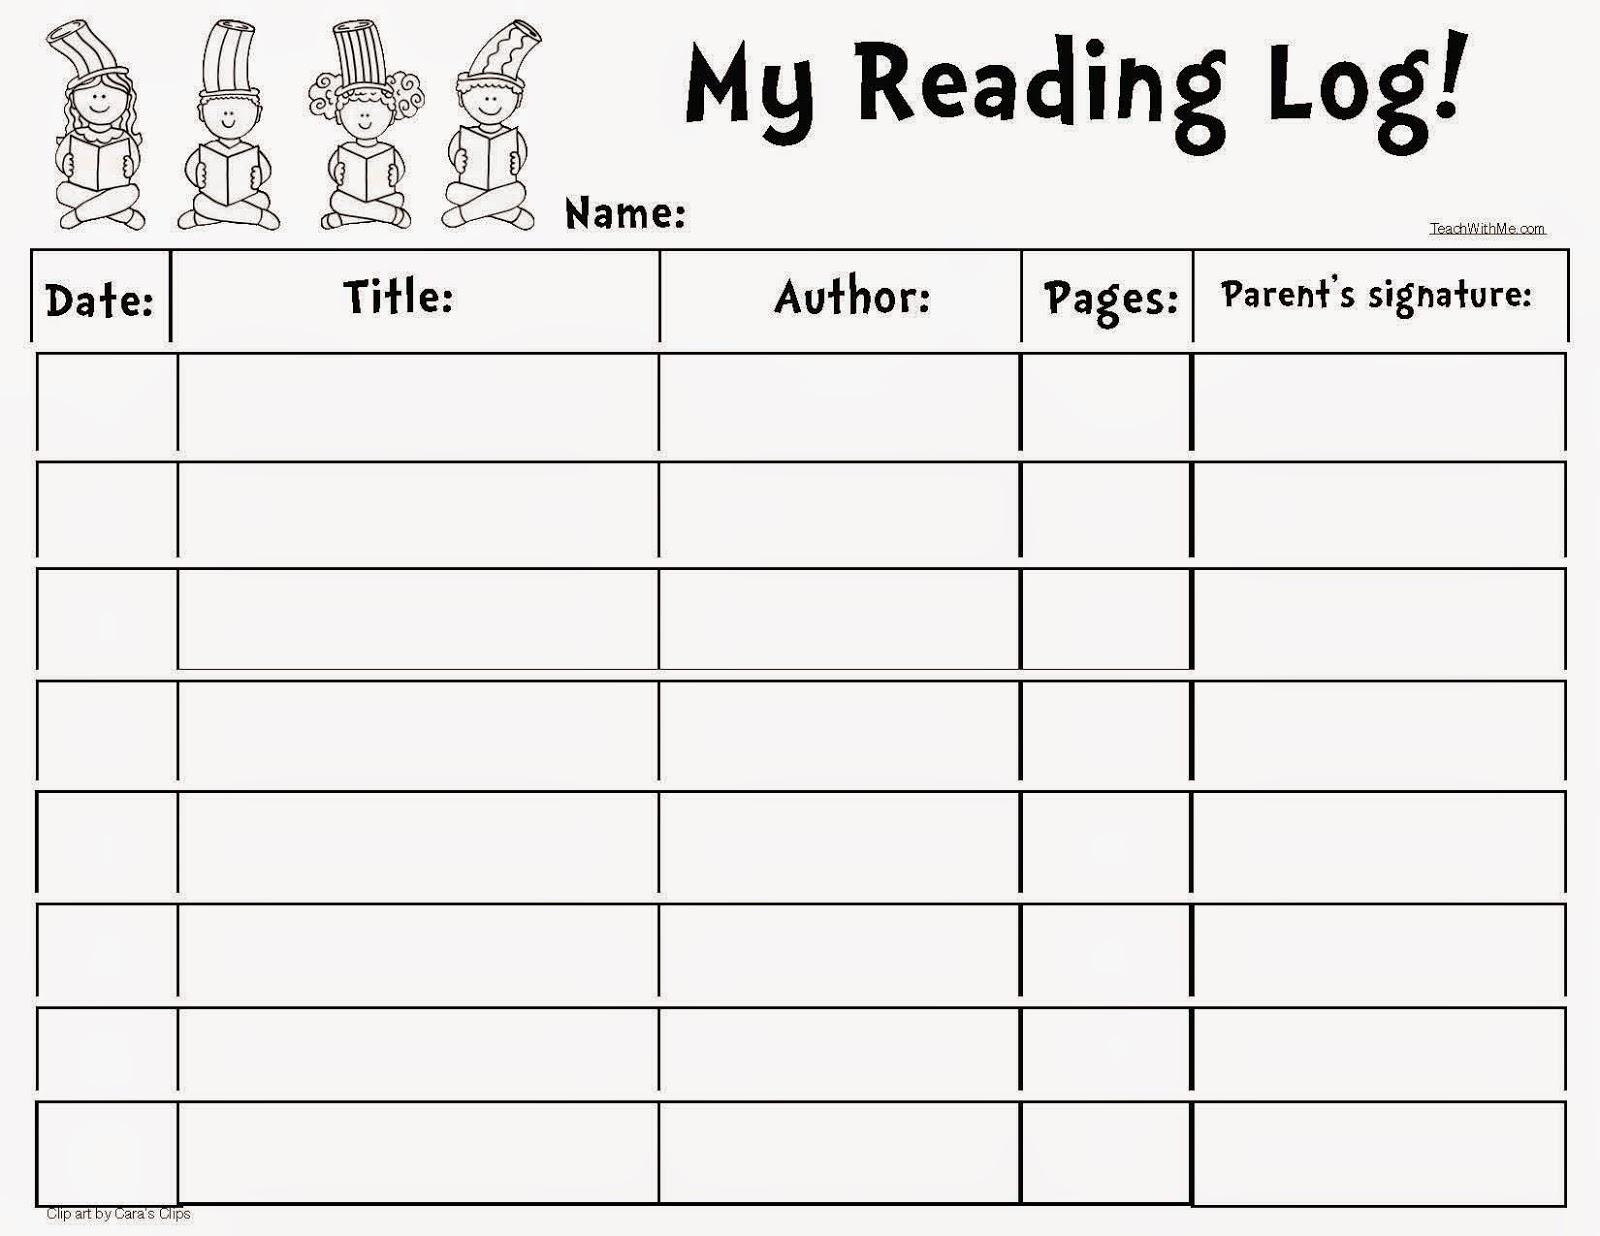 Classroom Freebies: Seuss-Themed Reading Log